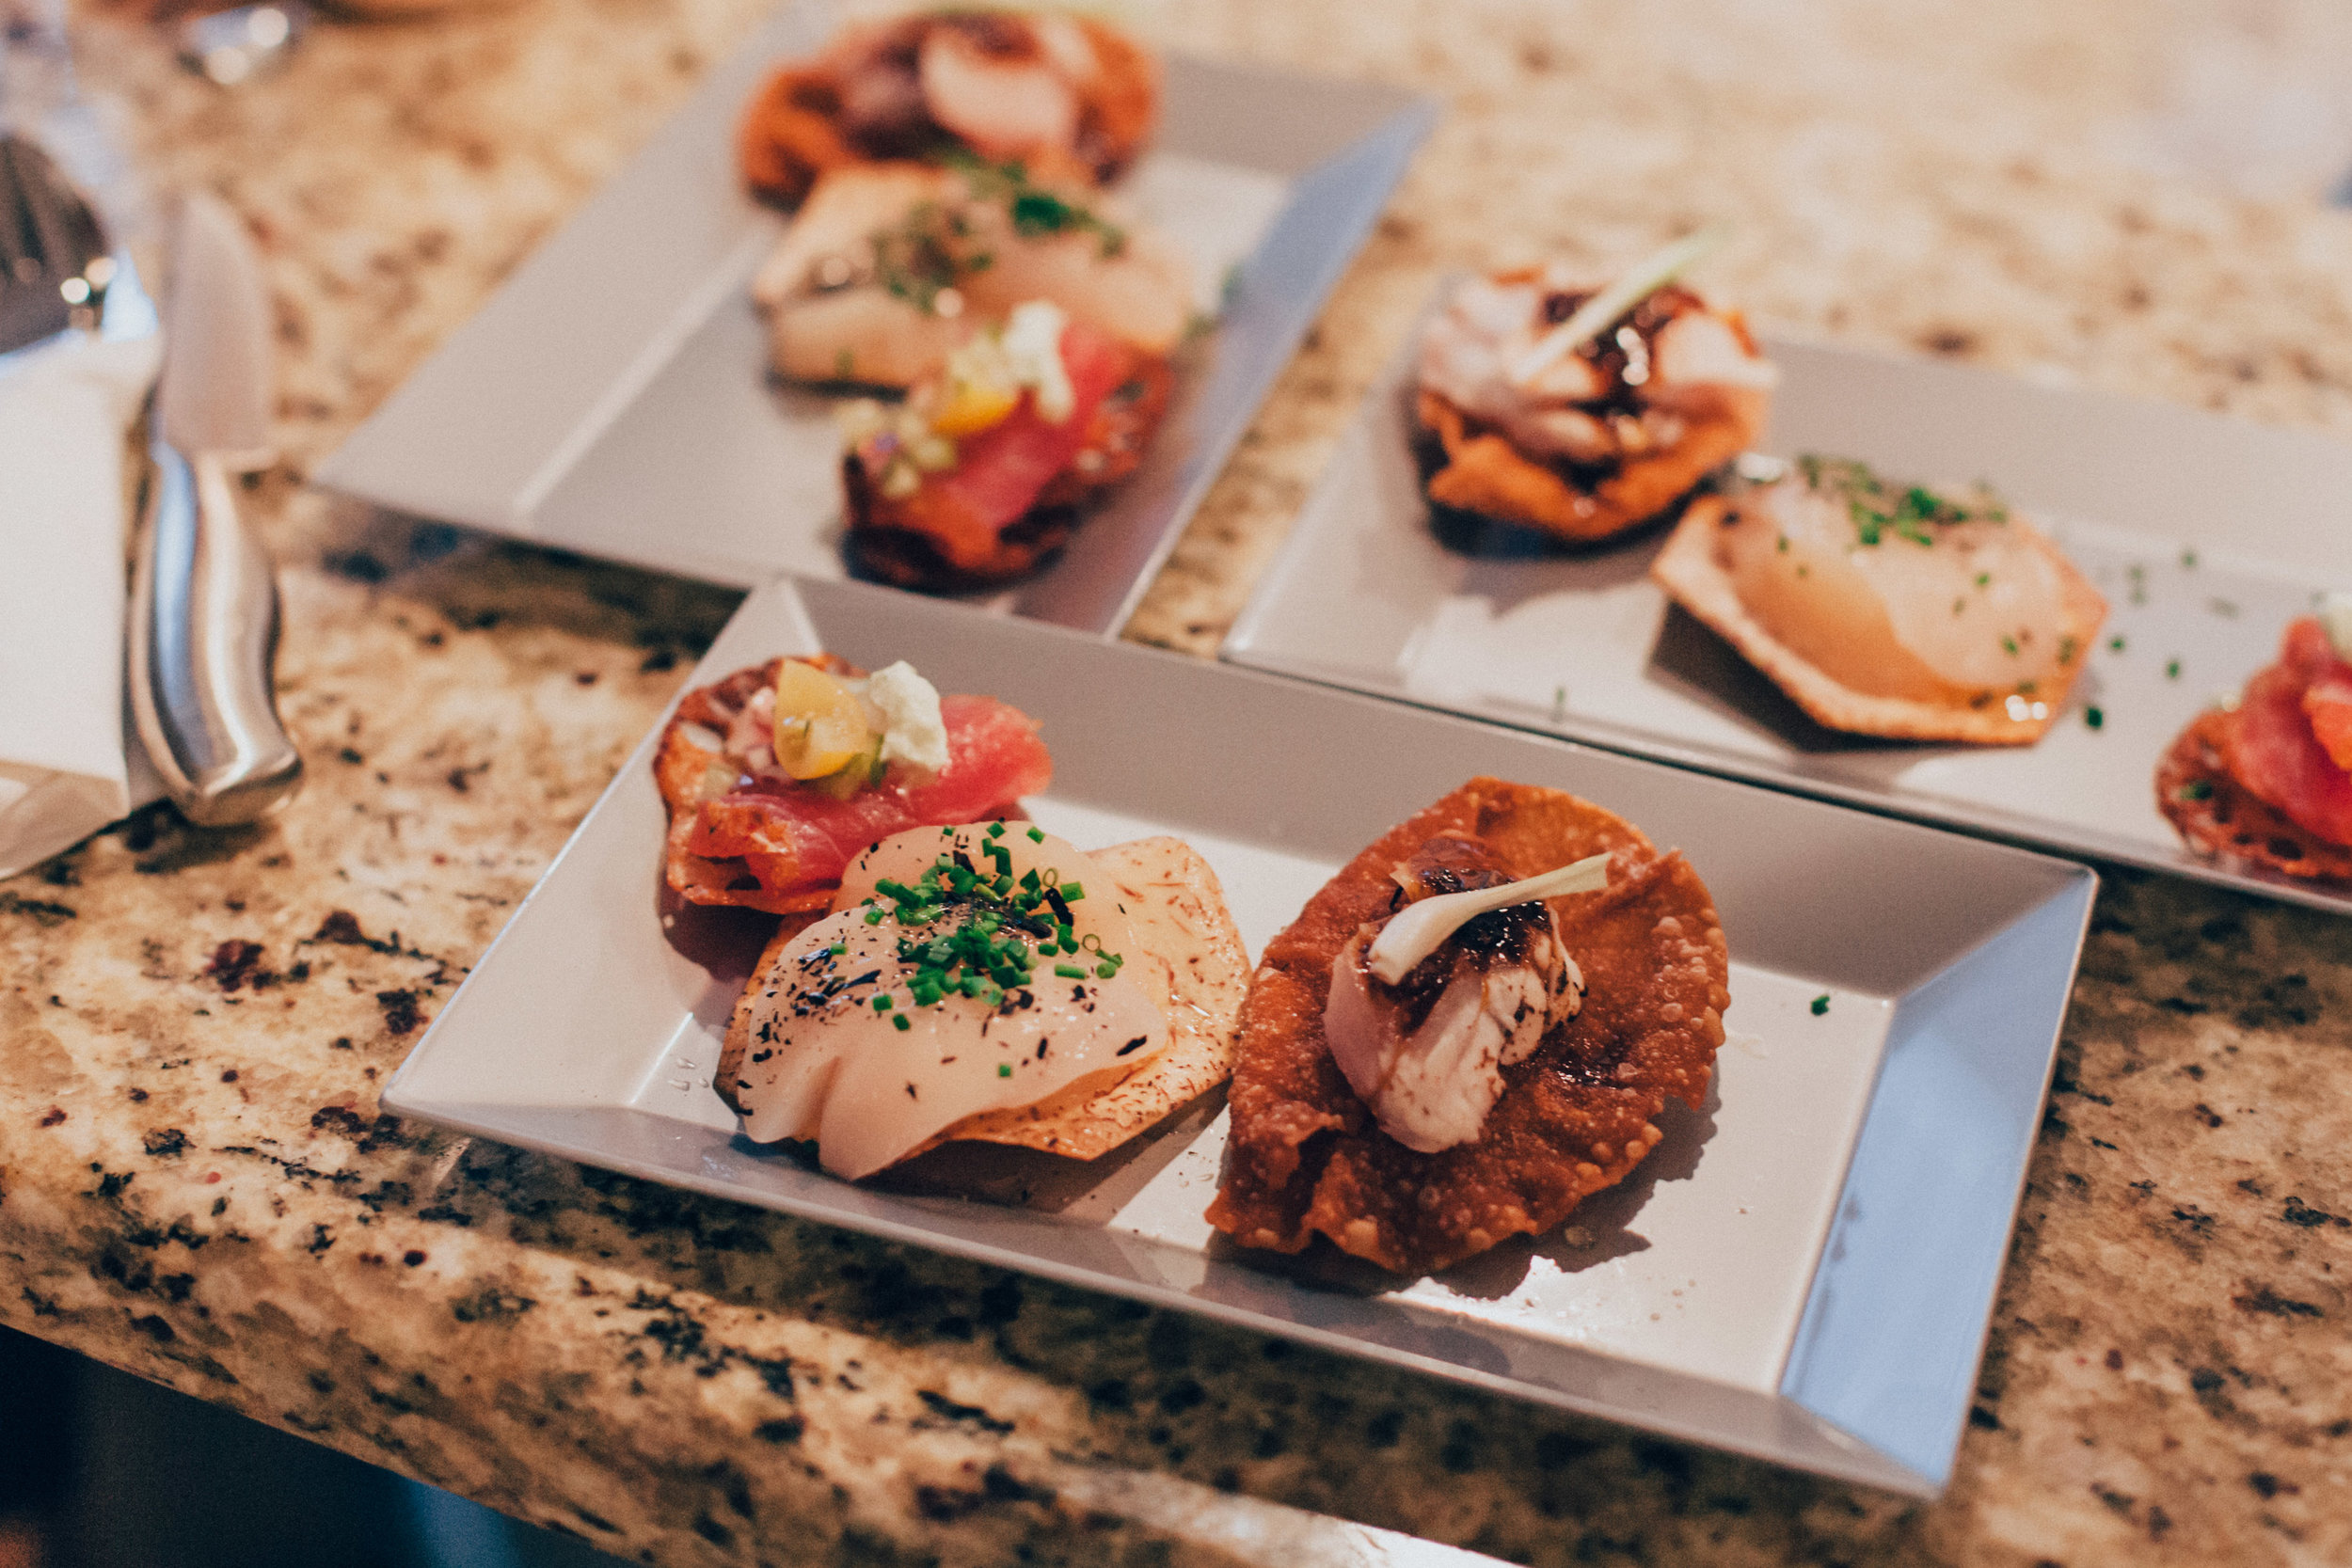 Jalapeno and cucumber tuna sashimi atop lotus root crisps | Truffle-orange Japanese scallops atop taro crisps | Red snapper sashimi with black bean sauce atop wonton crisps